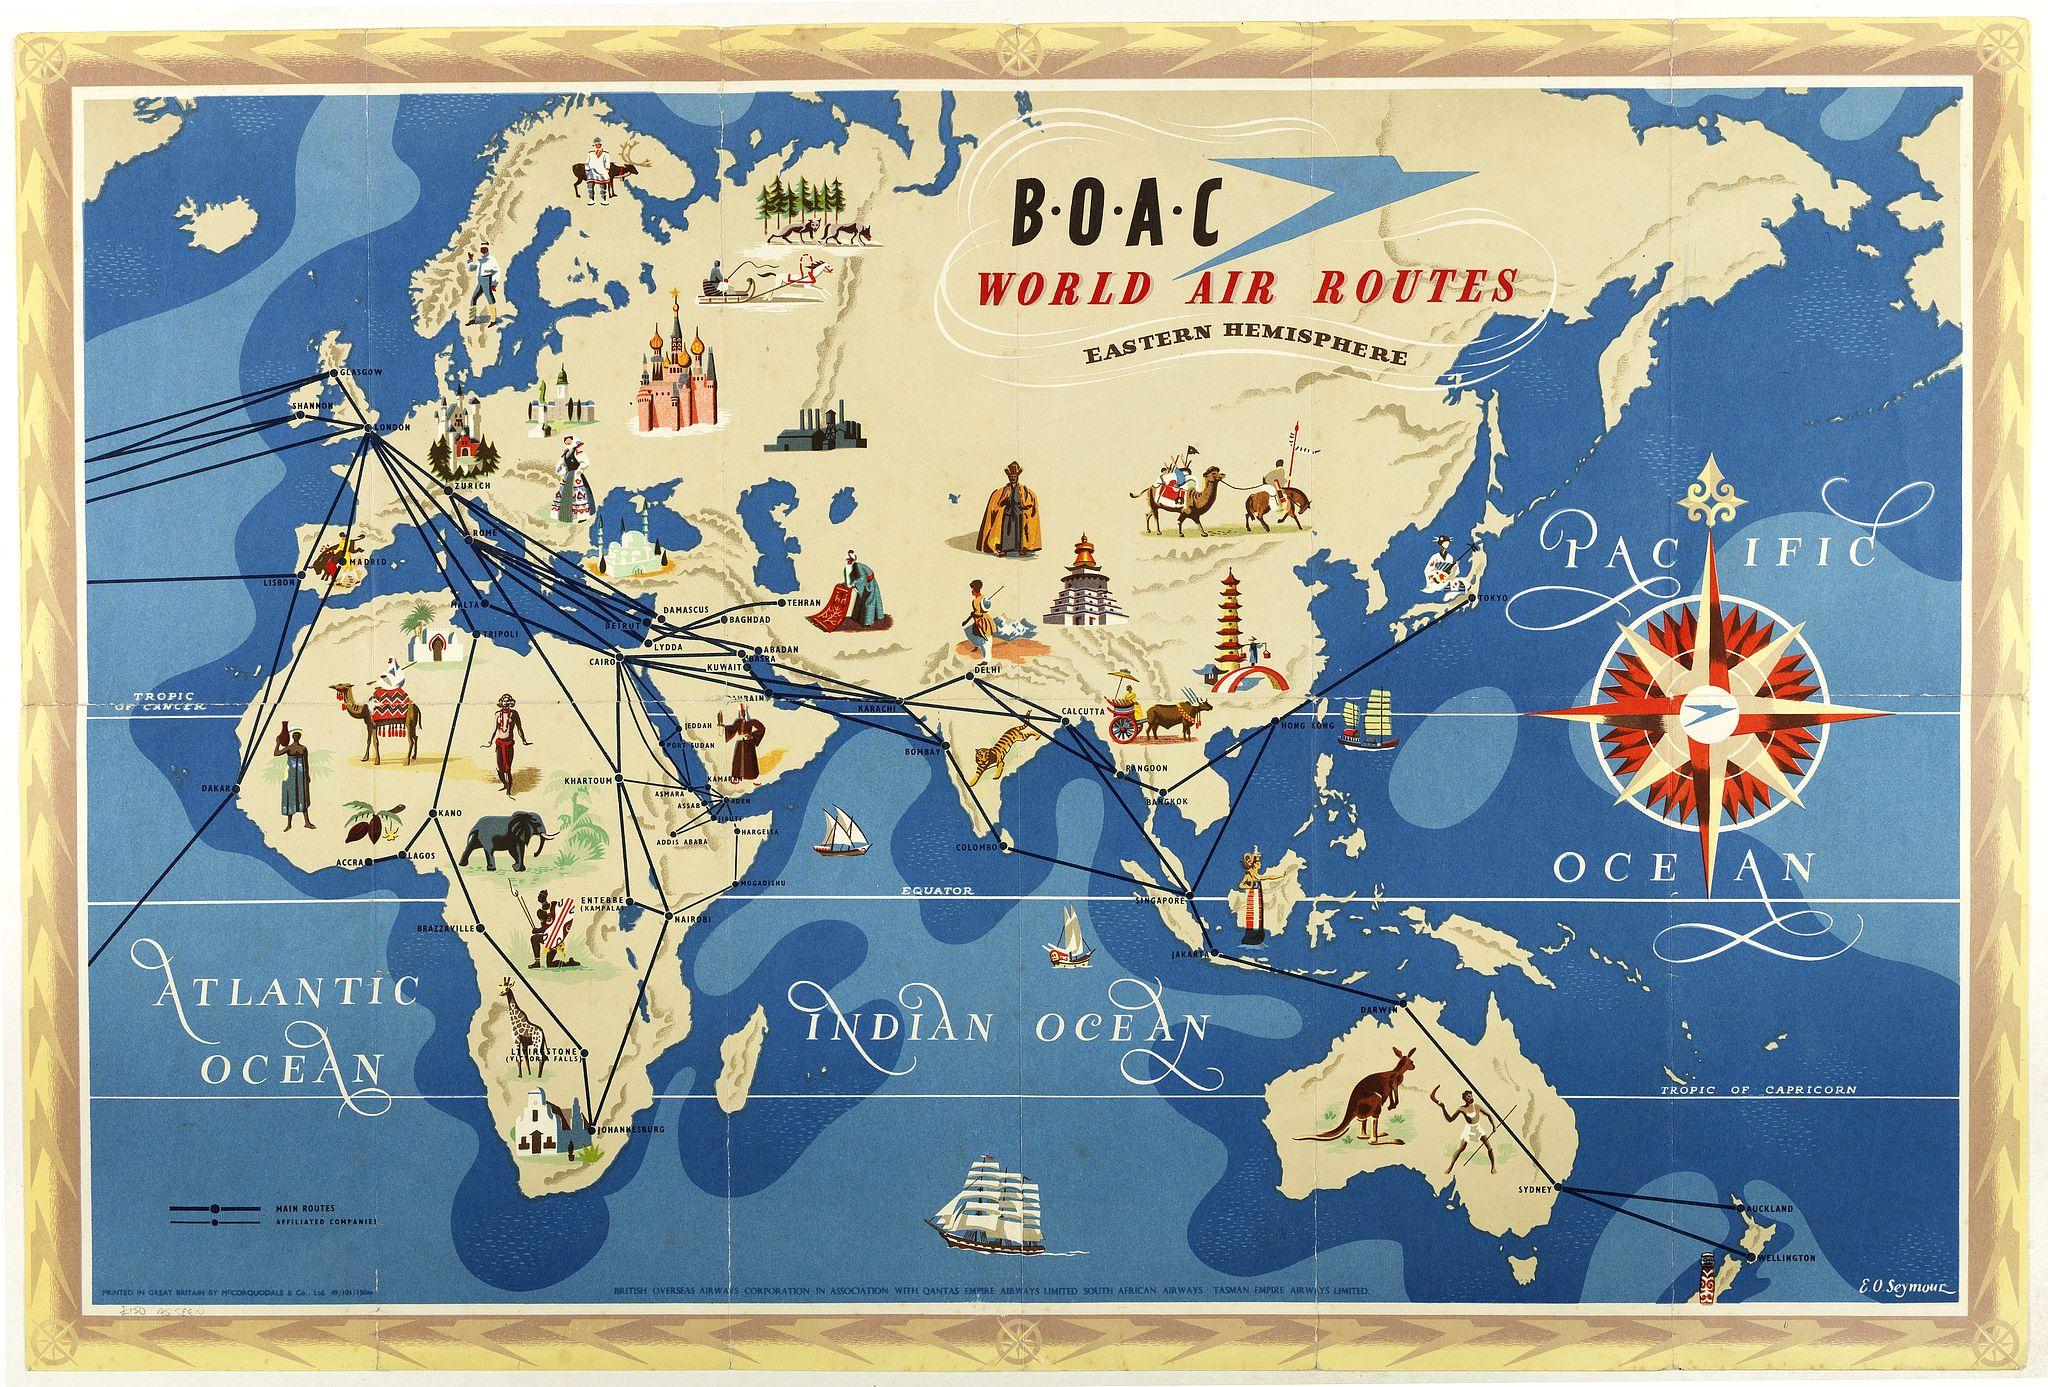 SEYMOUR, E. -  World Air Routes: Eastern Hemisphere / B.O.A.C. - World Air Routes: Western Hemisphere.